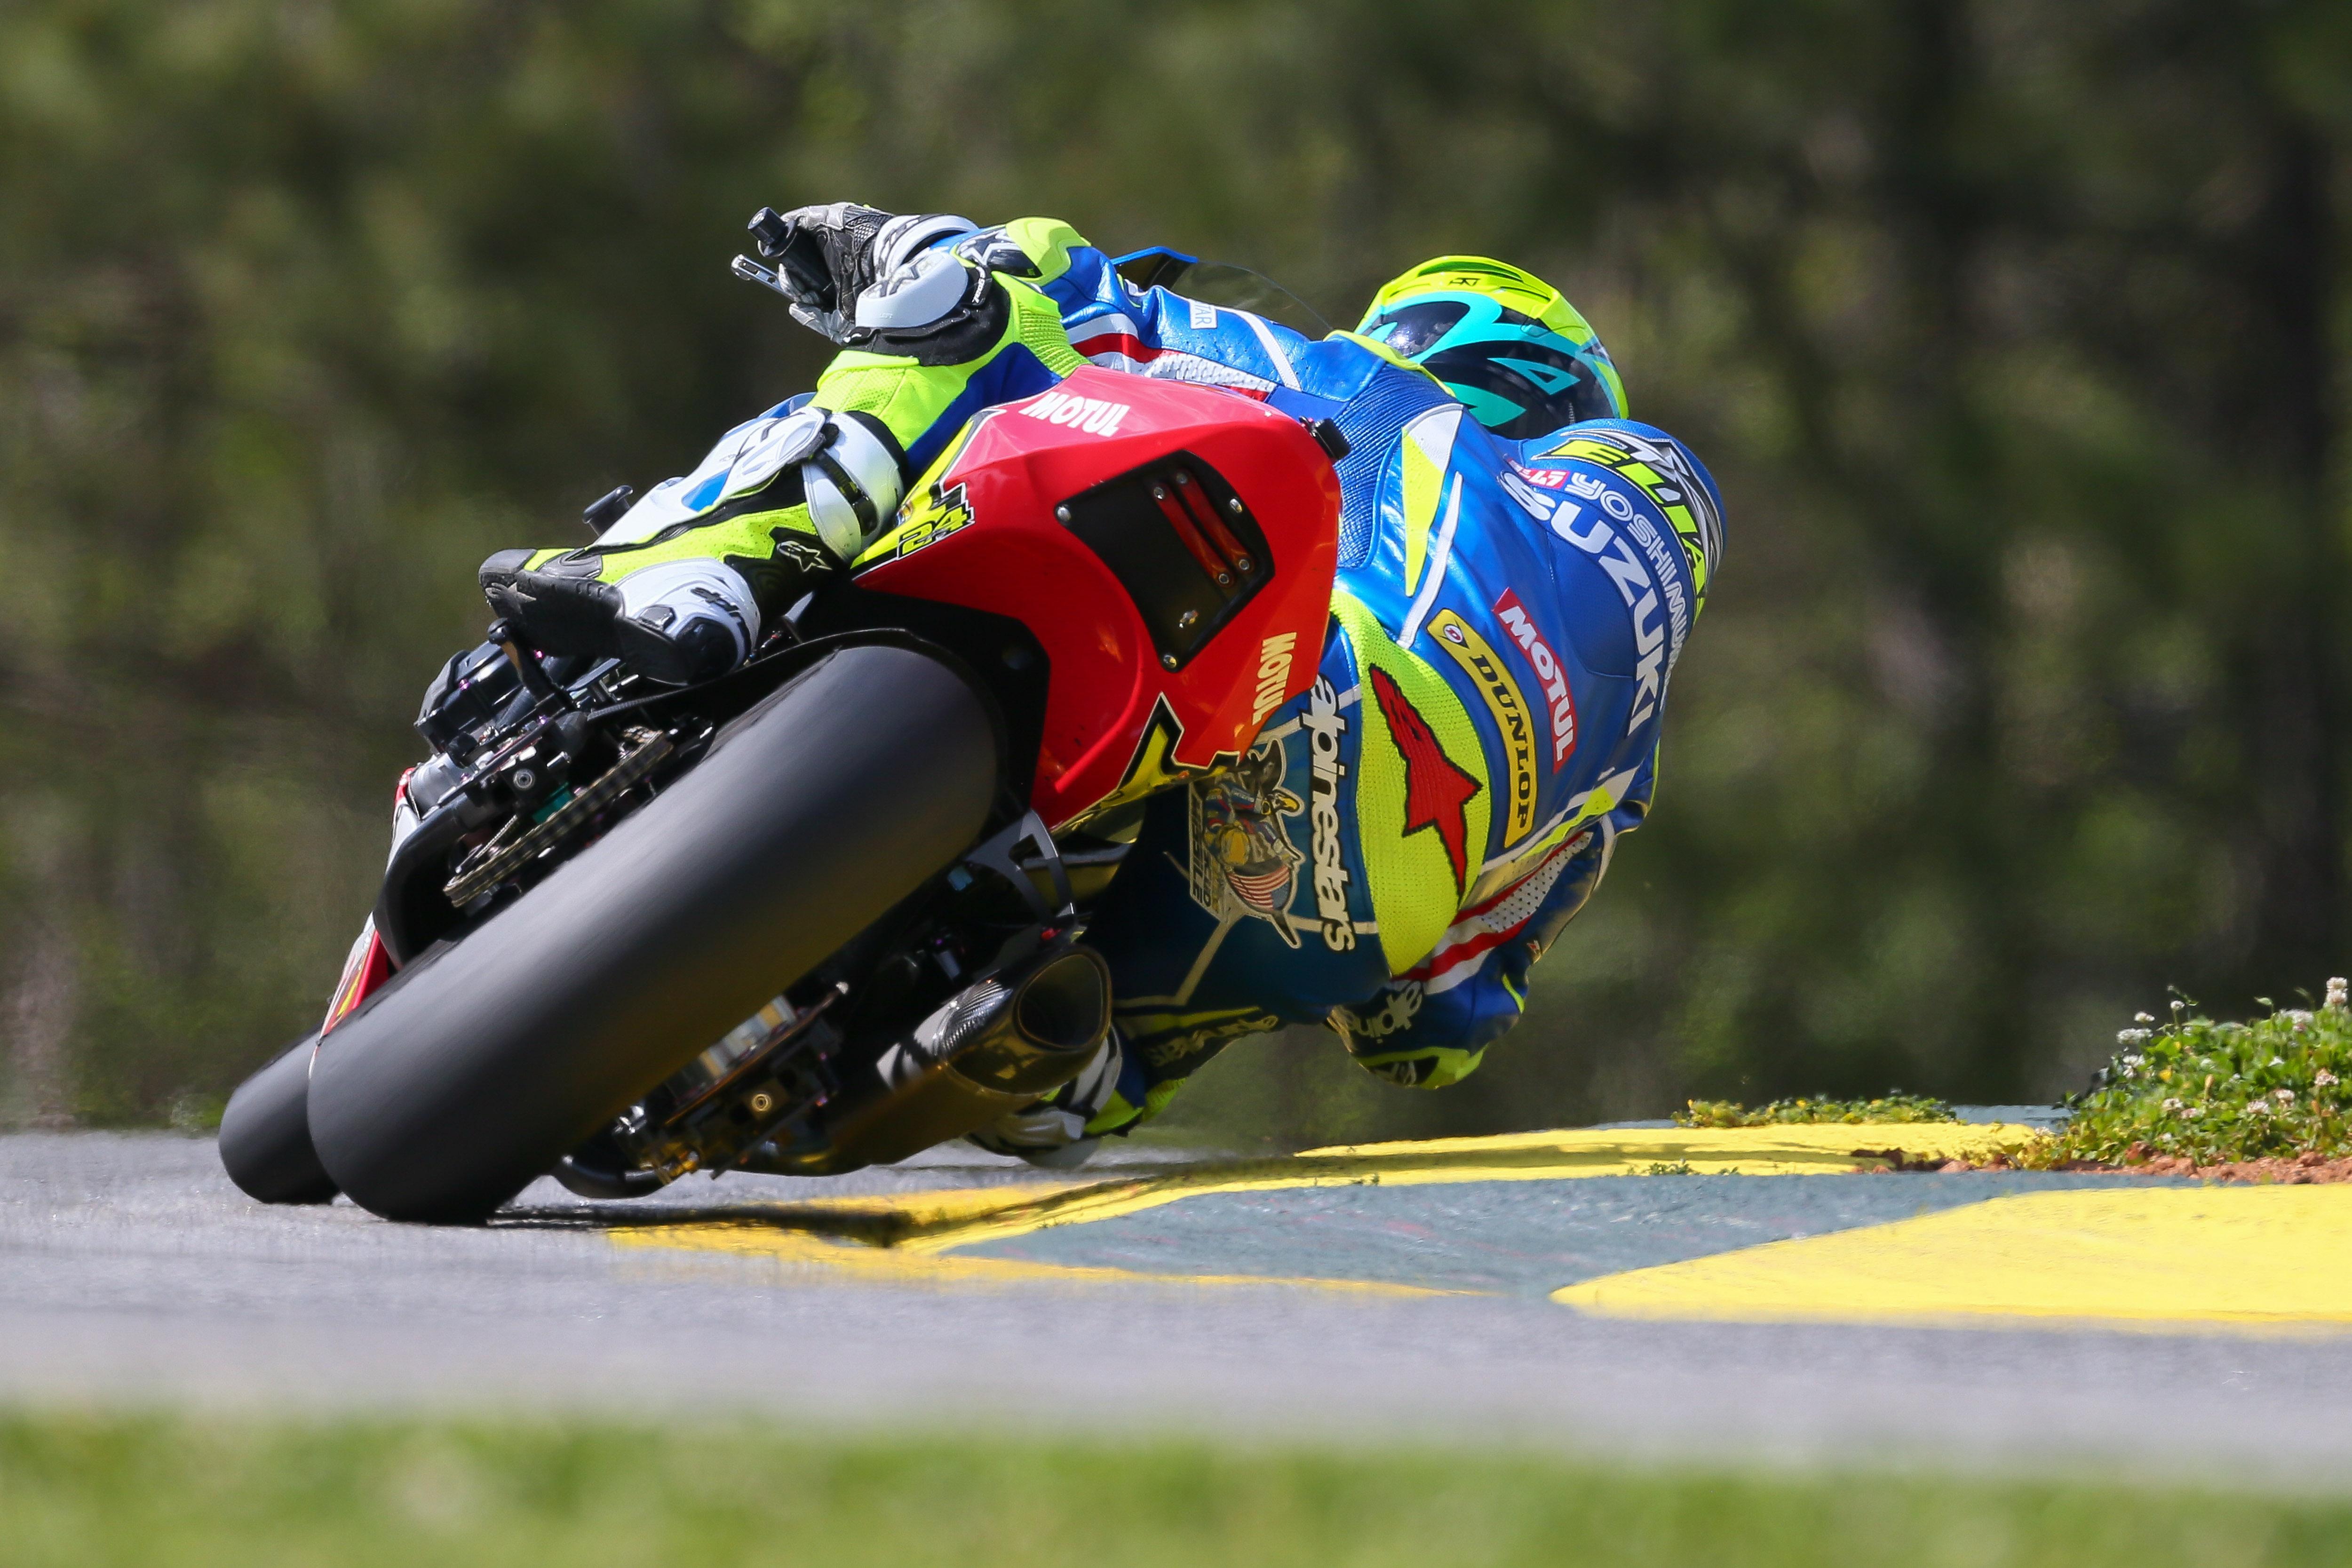 Suzuki racing: as ambitious as ever!